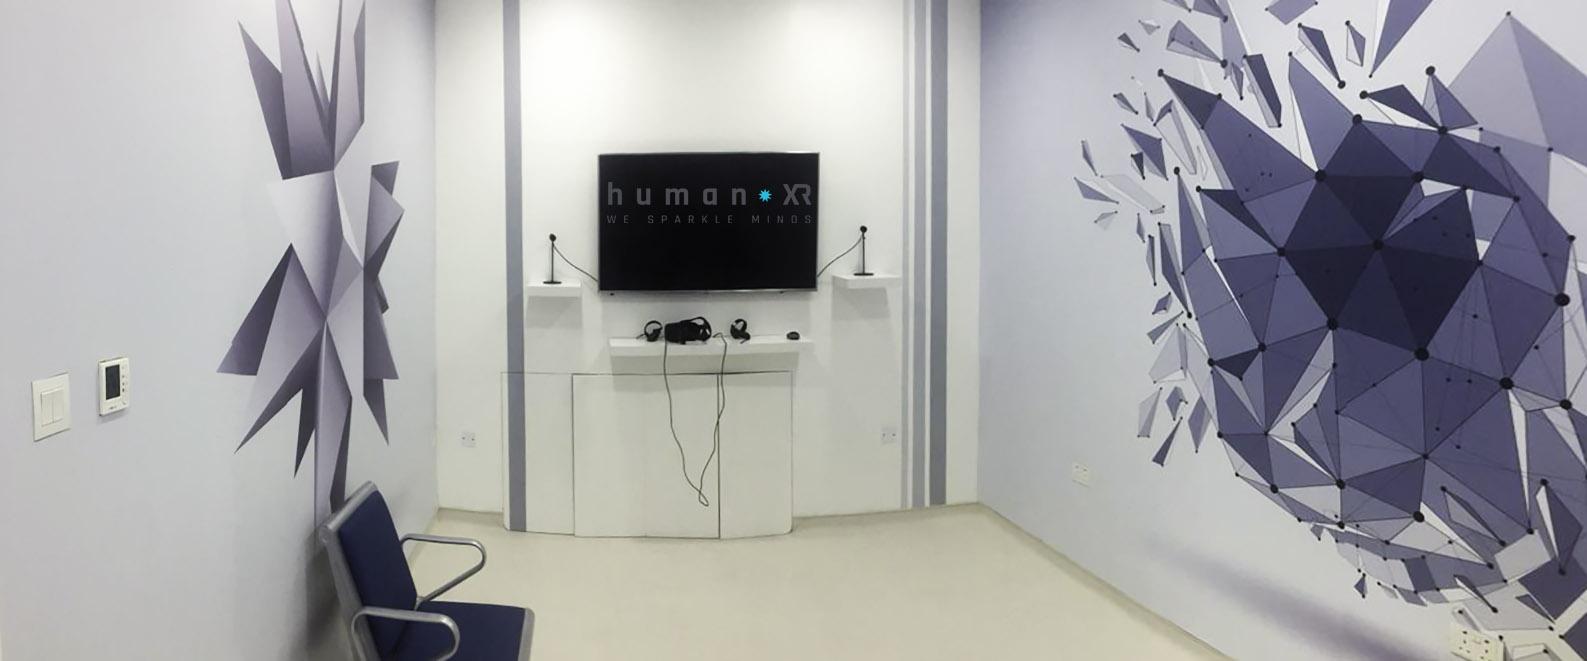 design vr room thumbay group hospital dubai